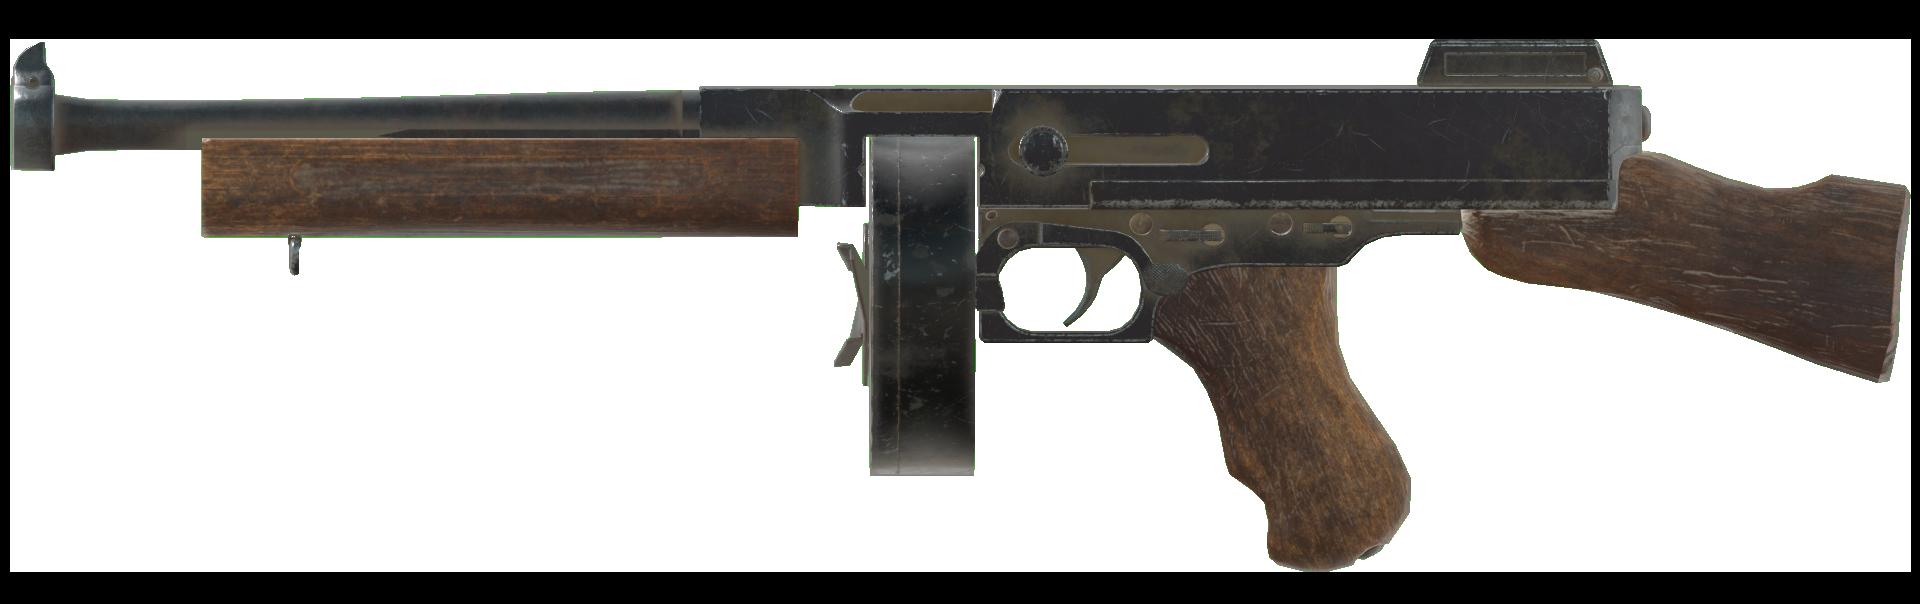 Submachine gun (Fallout 76)